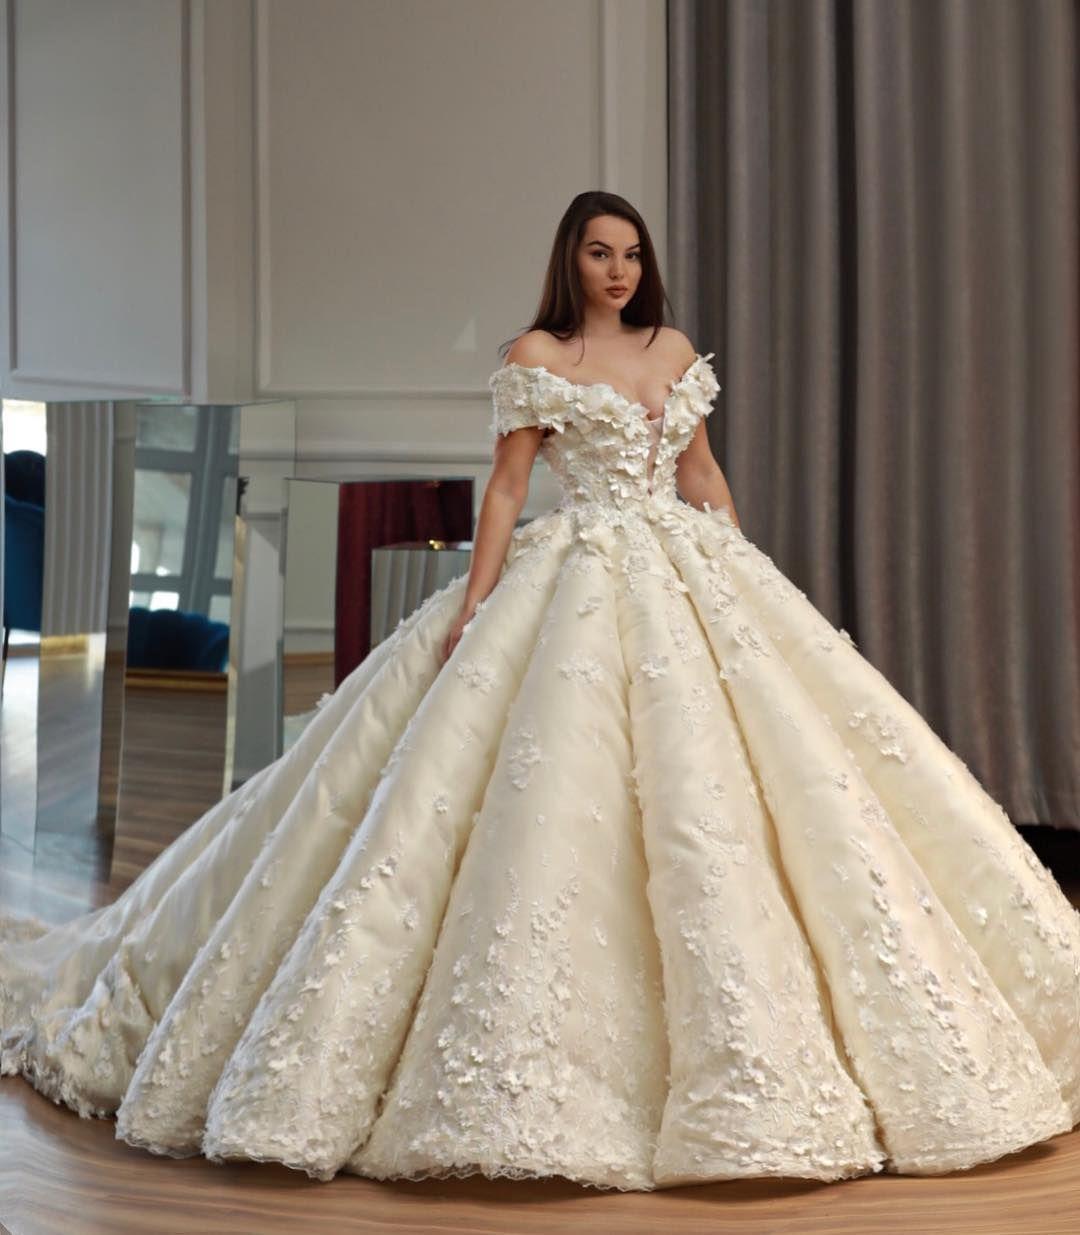 Saudi Dubai Princess Wedding Dress Off Shoulder Beads 3D Floral Appliques Tule Ball Gown Wedding Dresses Charming Arabia Bridal Wedding Gown